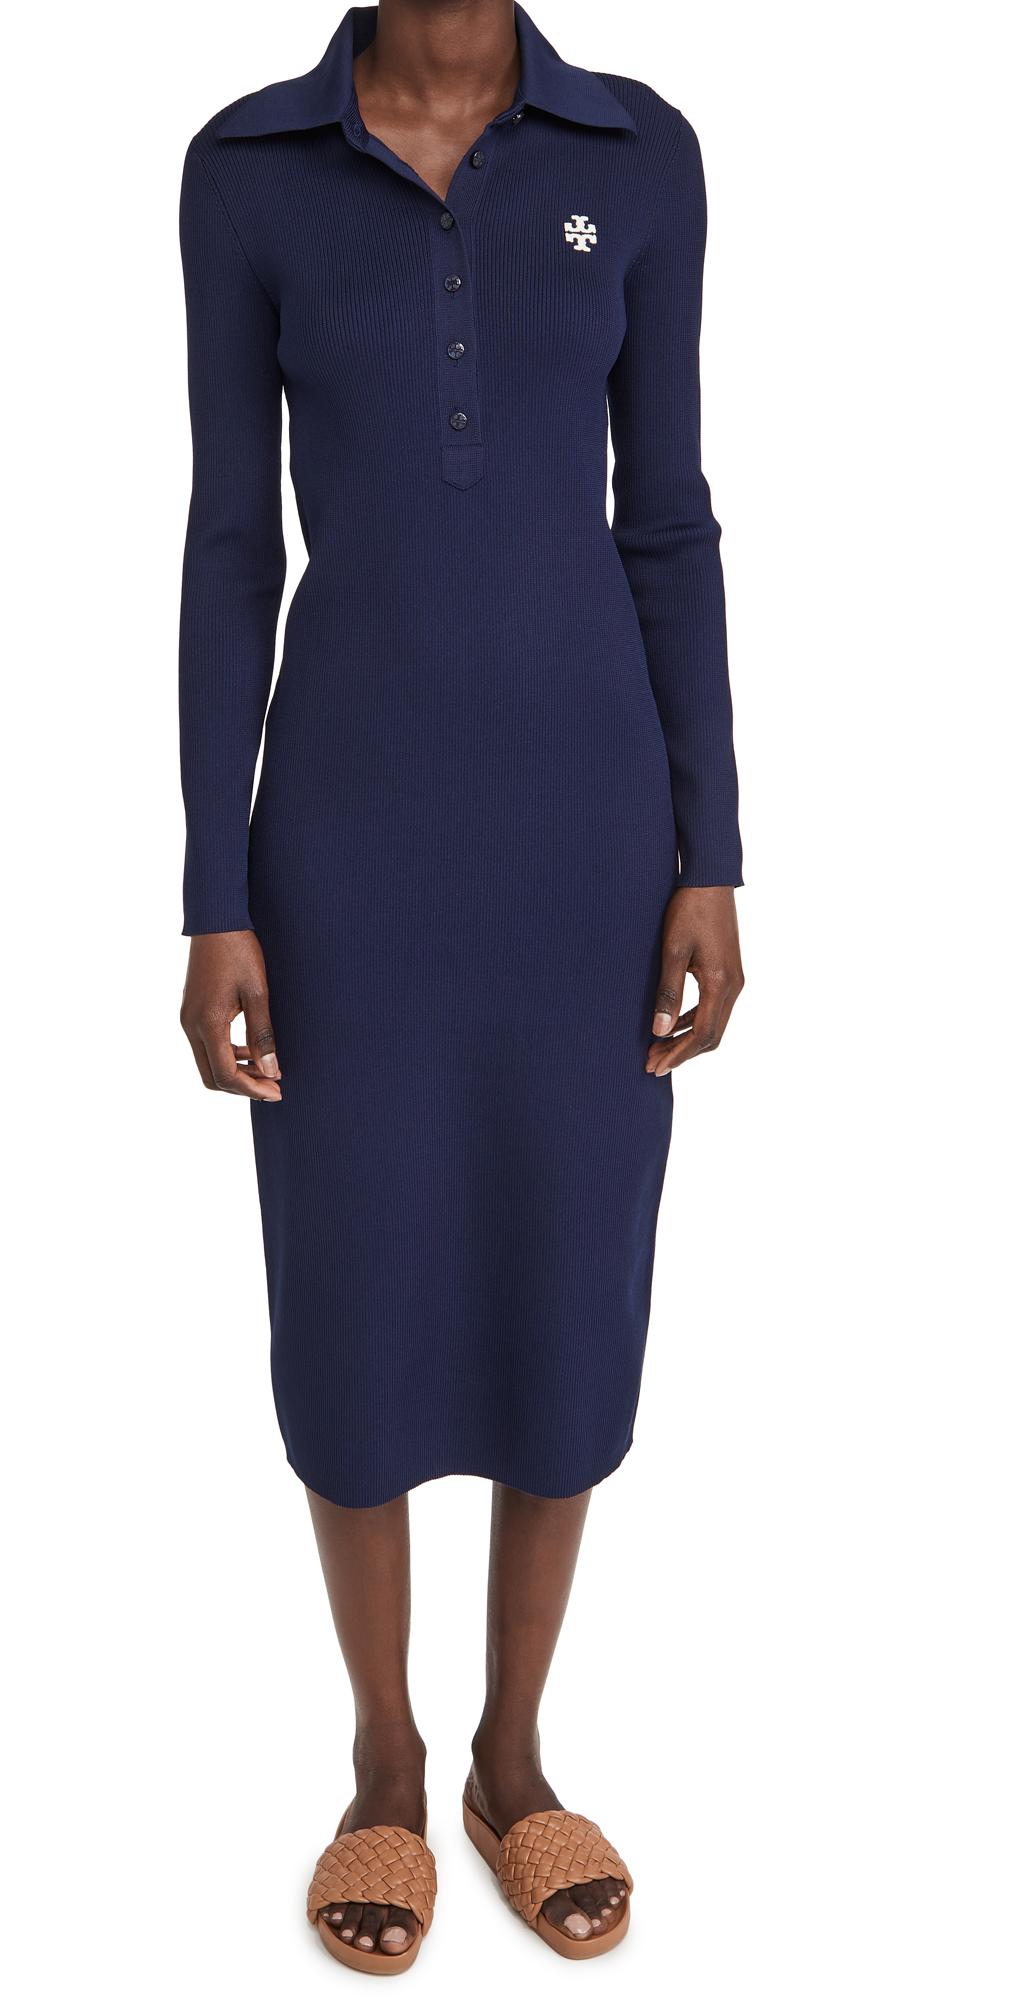 Tory Burch Dresses RIBBED POLO DRESS